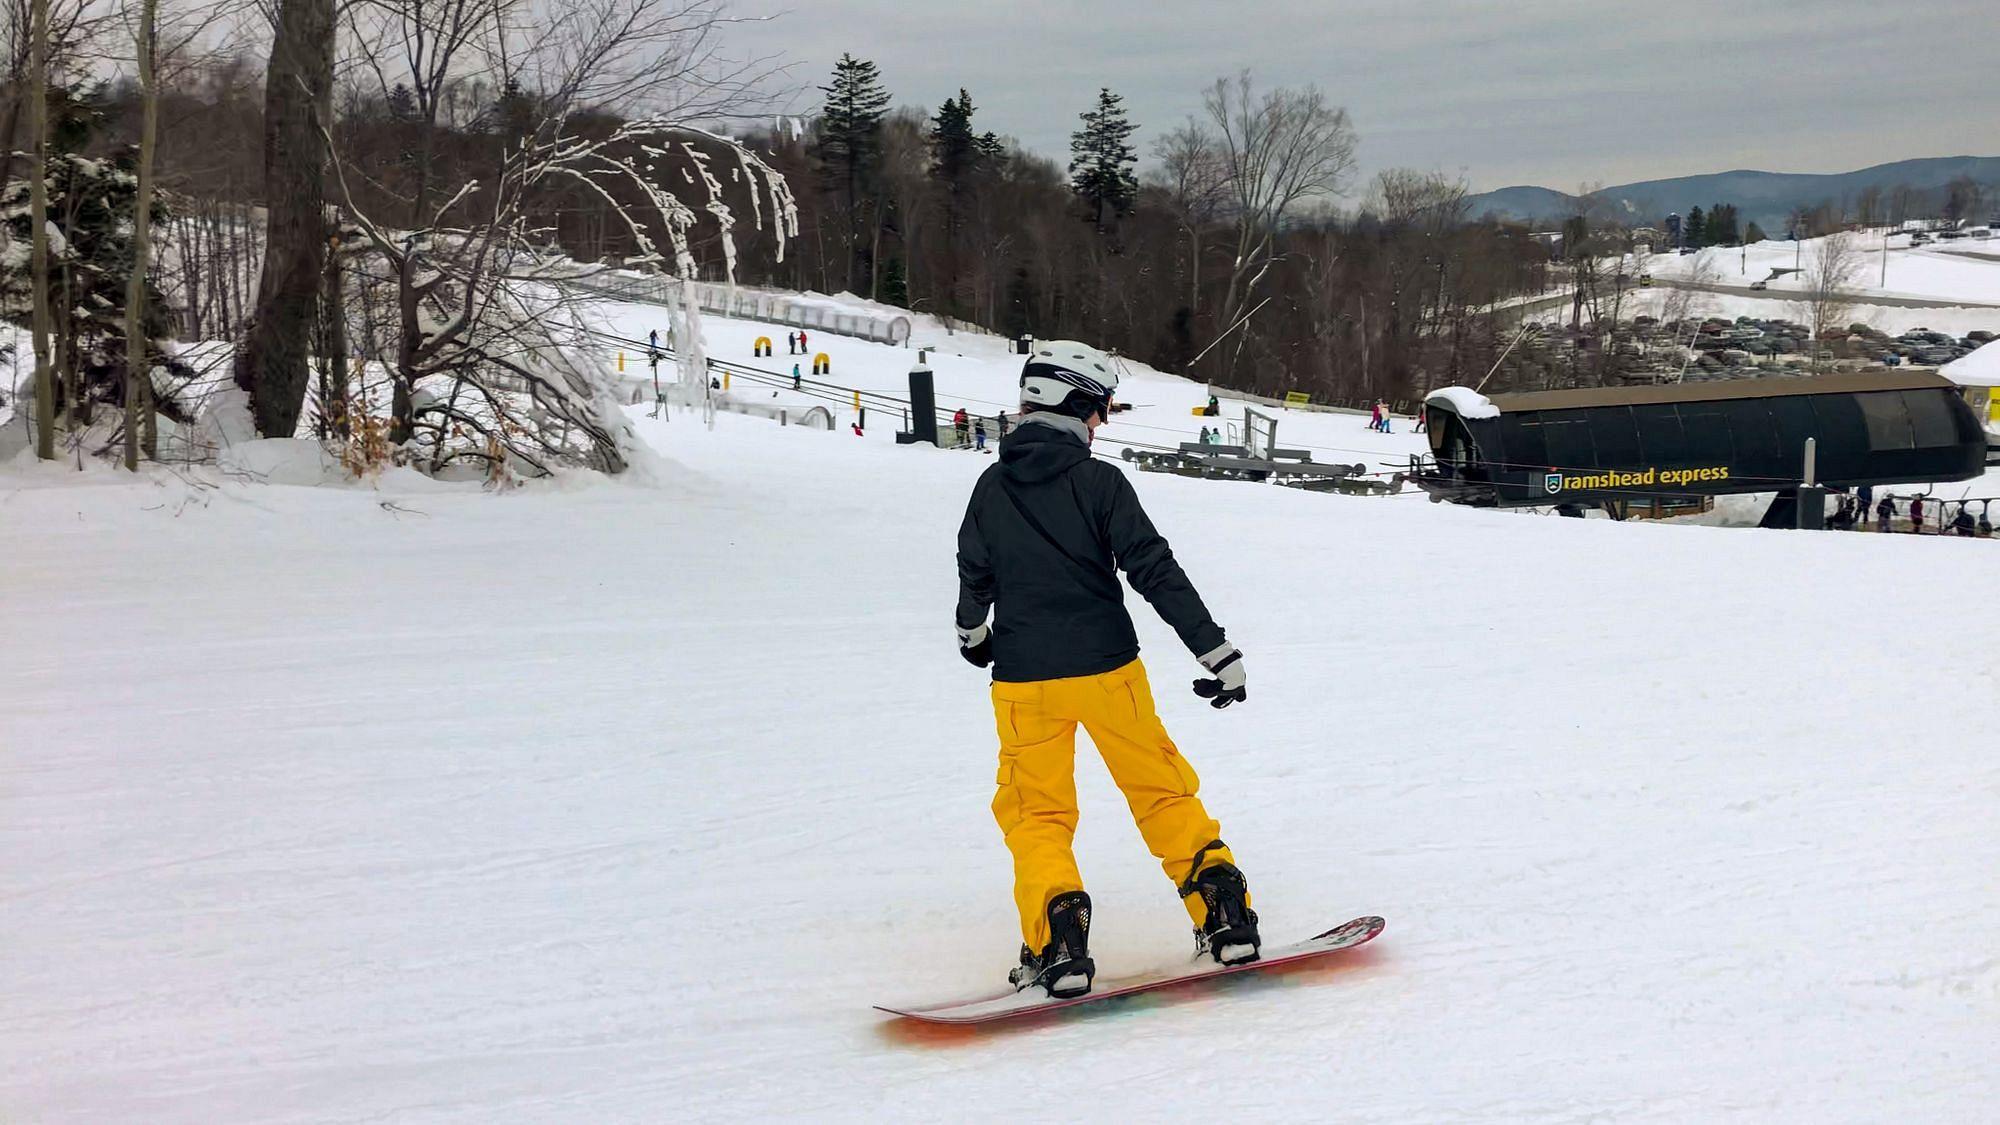 Snowboarding at Killington